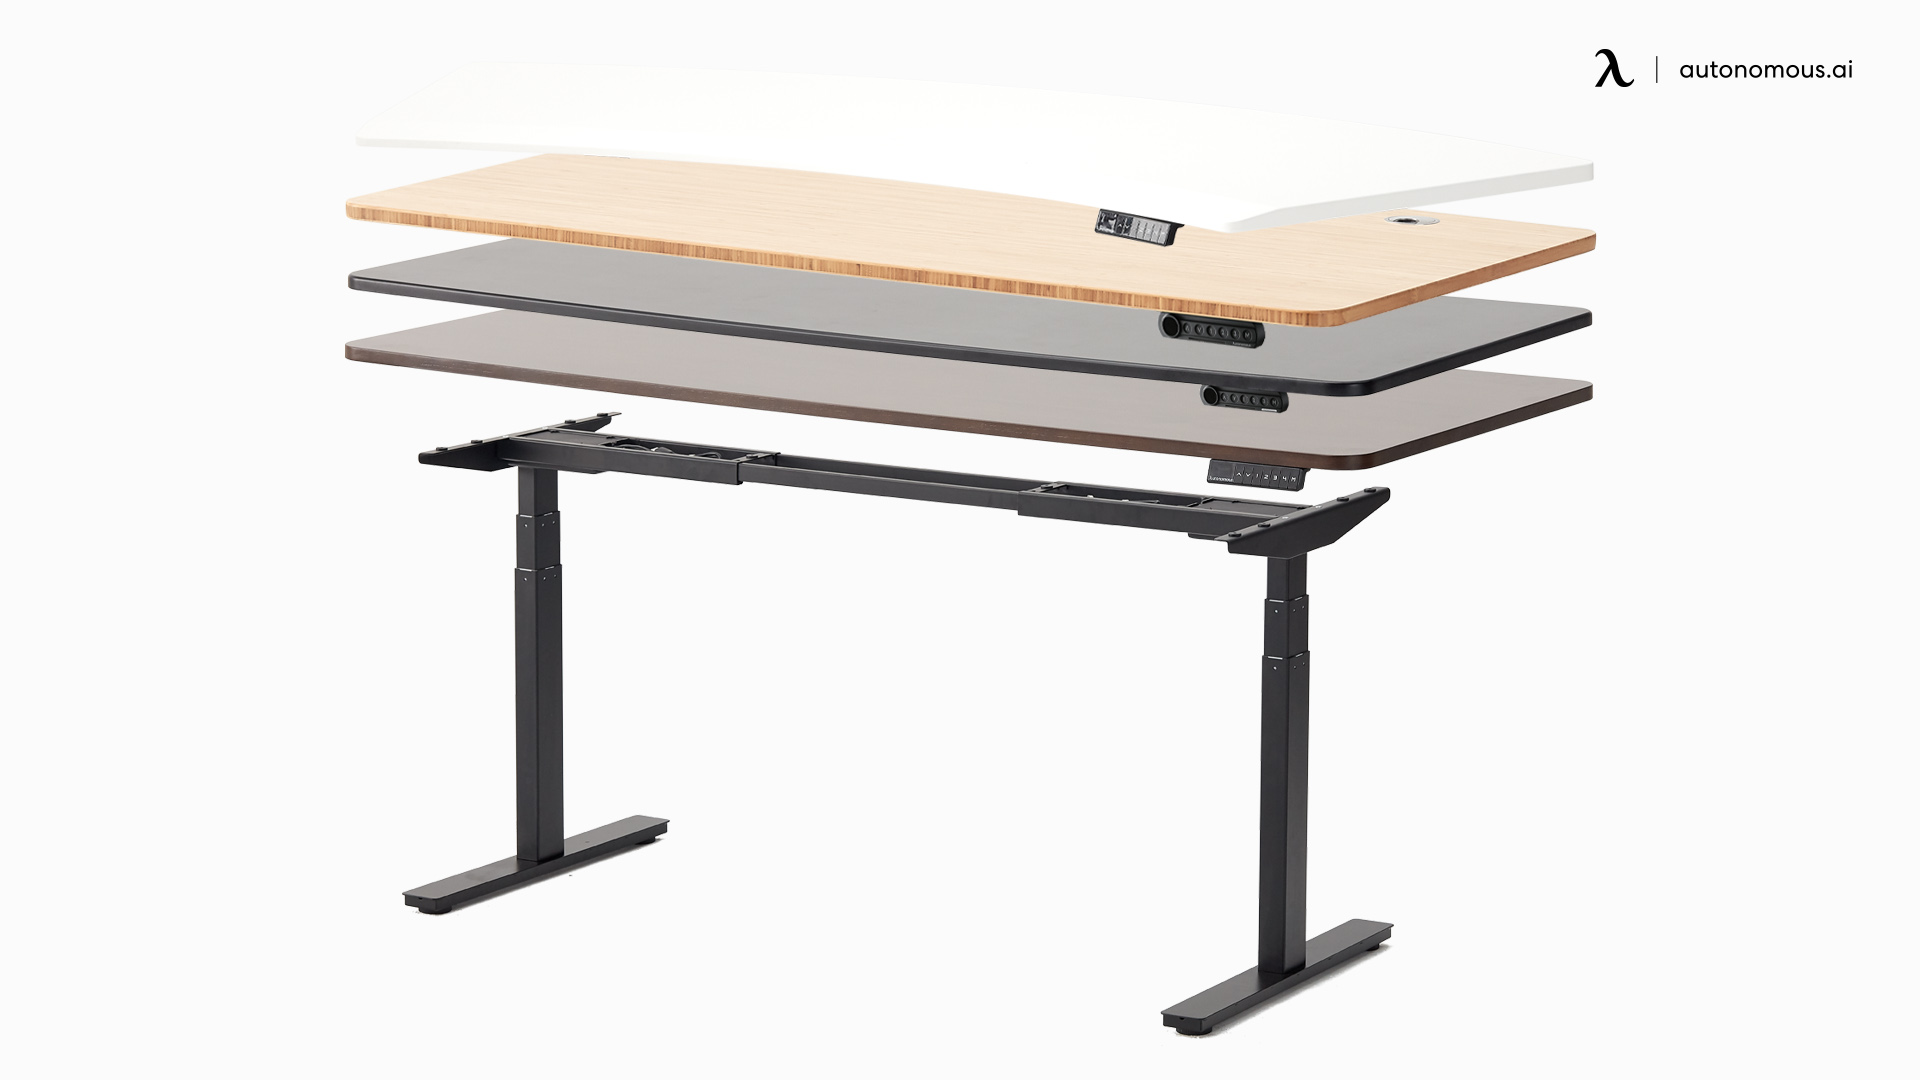 Step 2 – Choosing a Standing Desk Frame